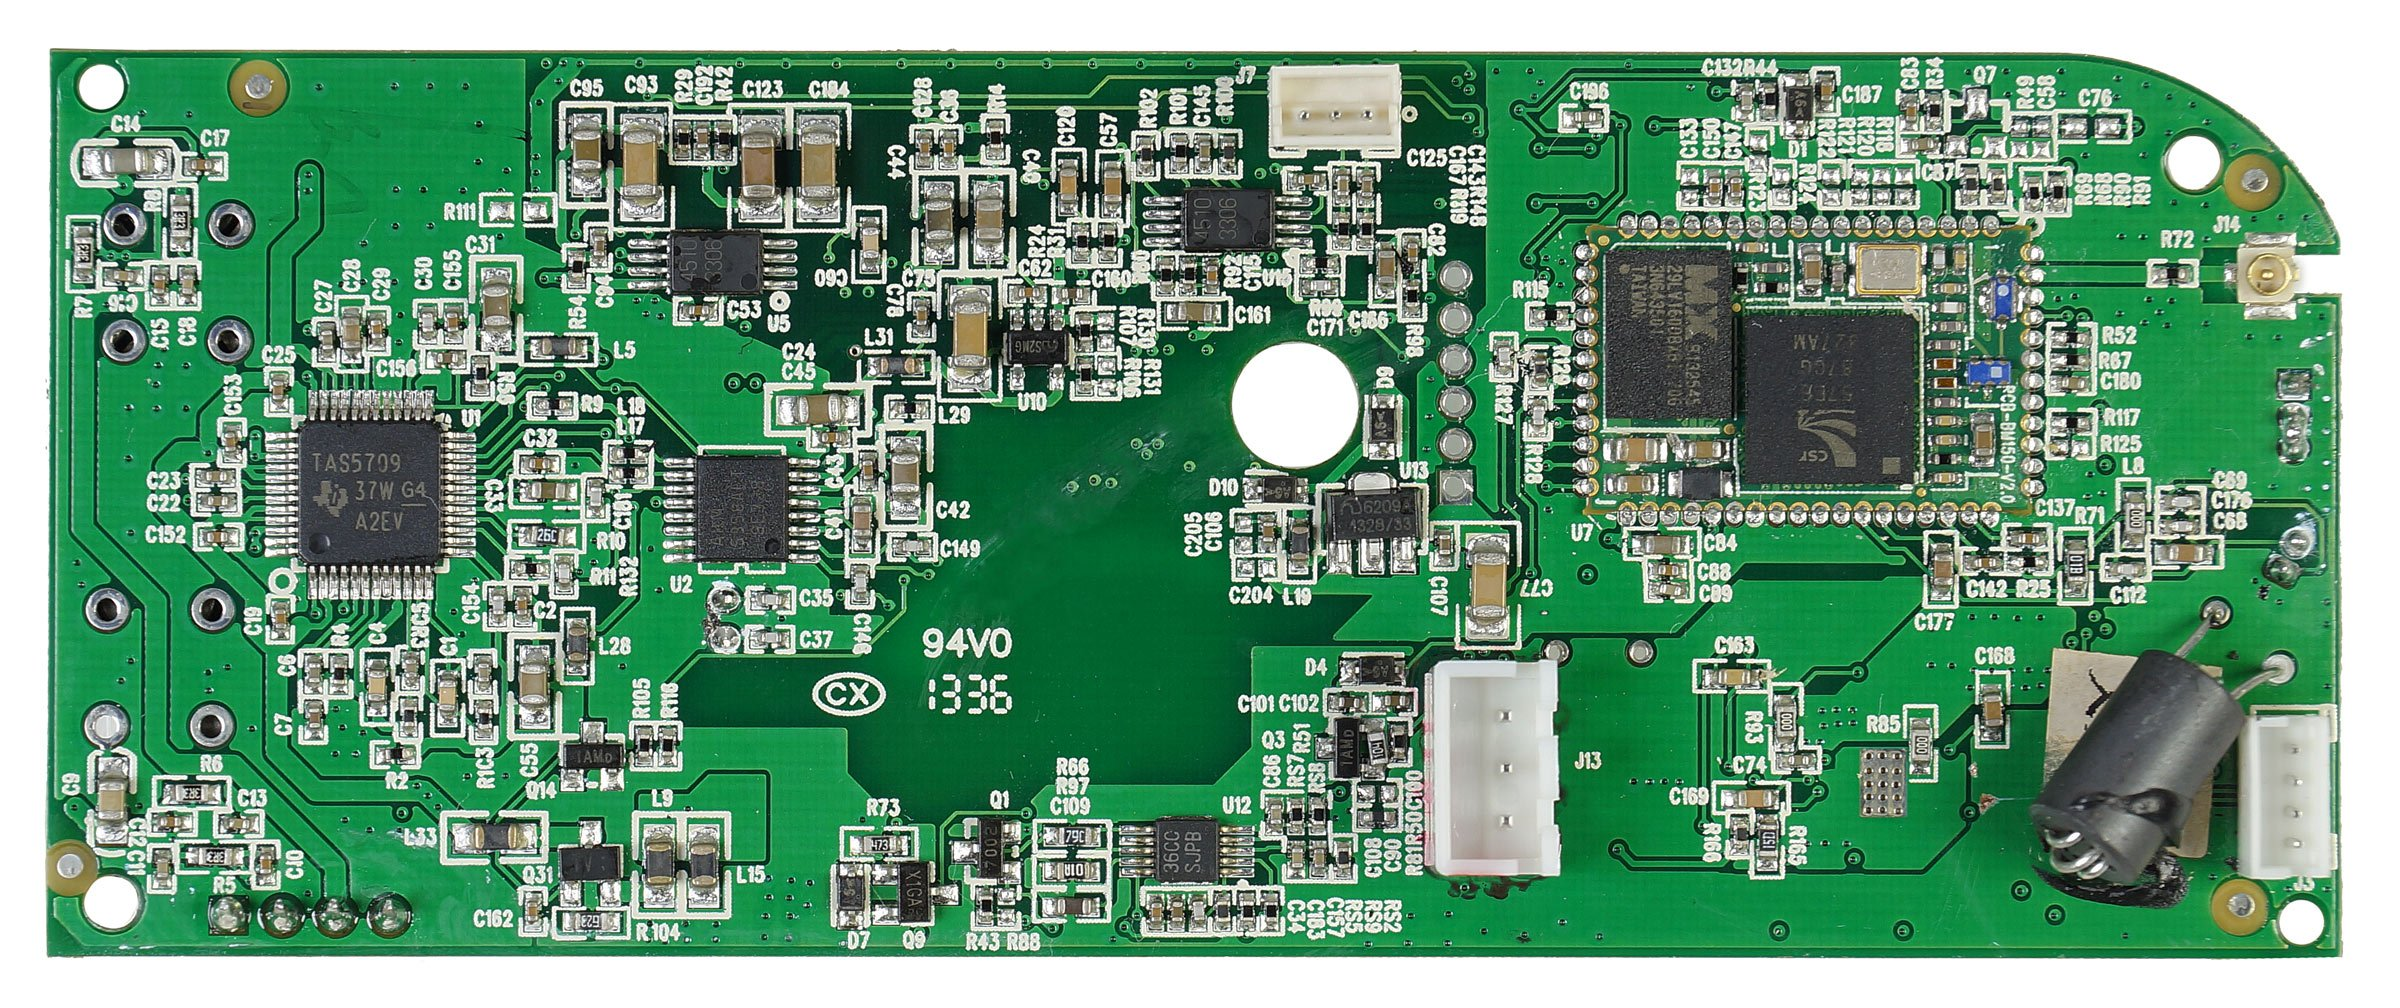 Teardown Jbl Flip 2 Electronics360